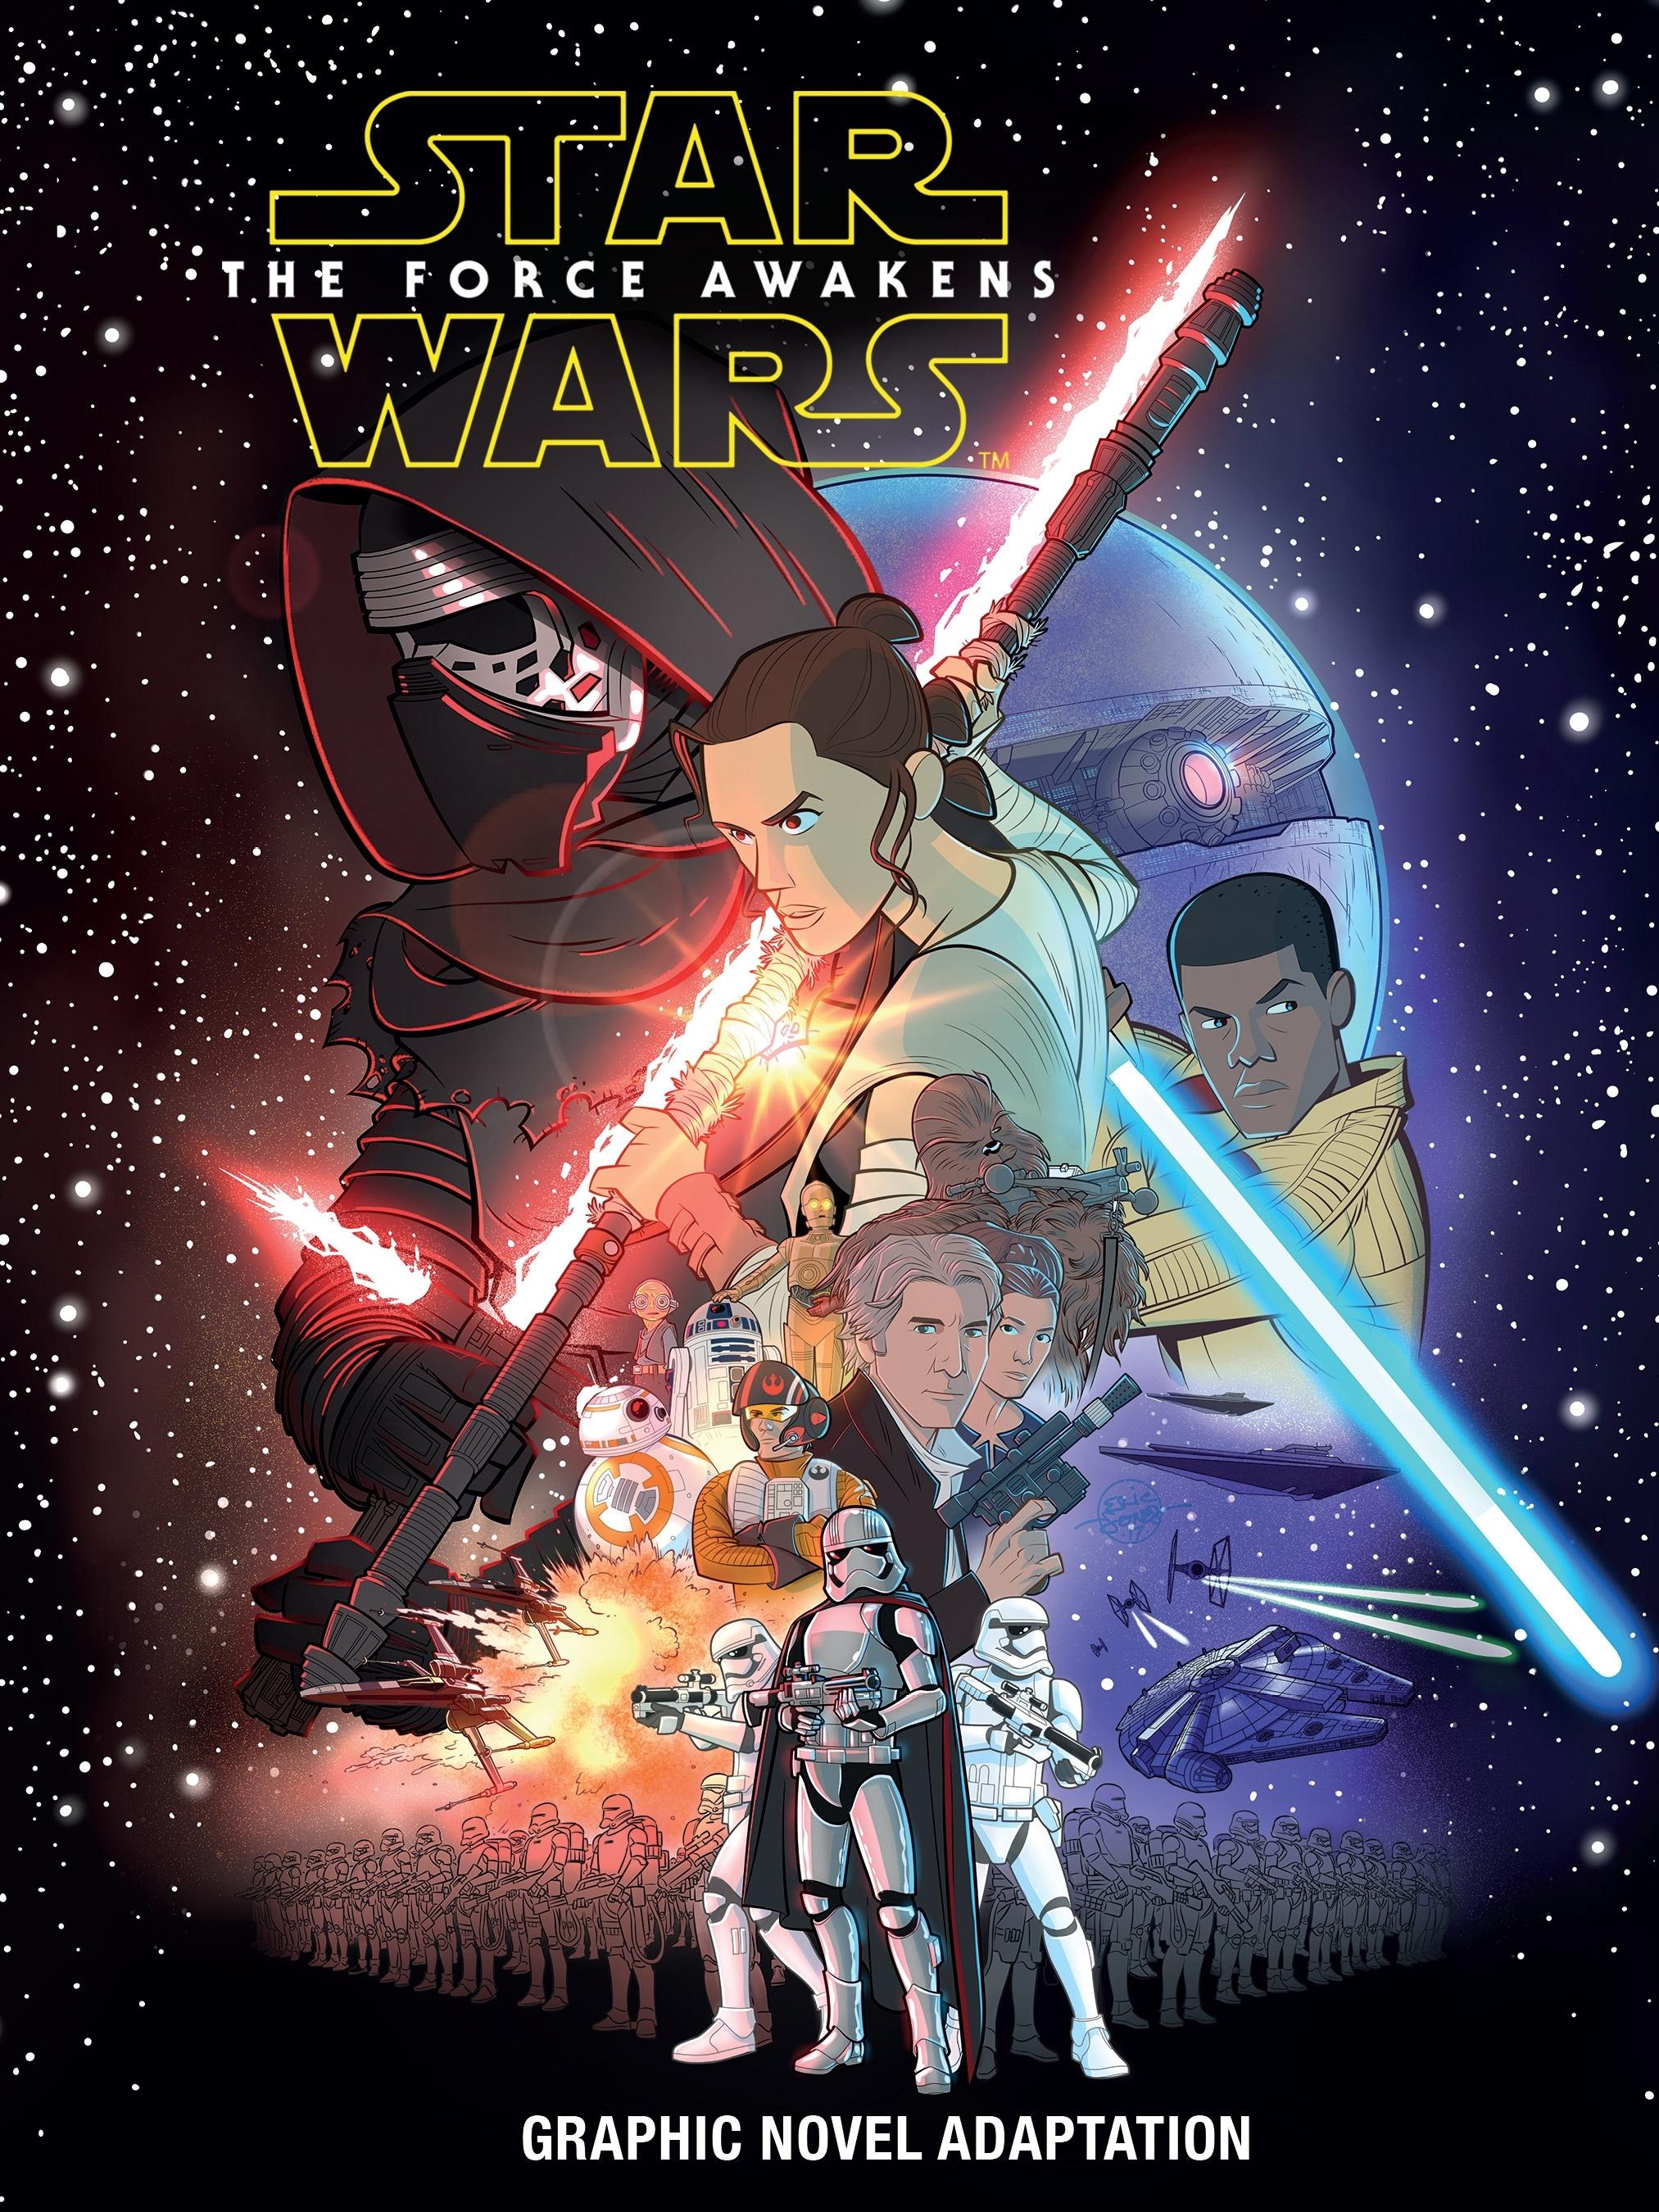 Star Wars The Force Awakens Graphic Novel Adaptation Wookieepedia Fandom